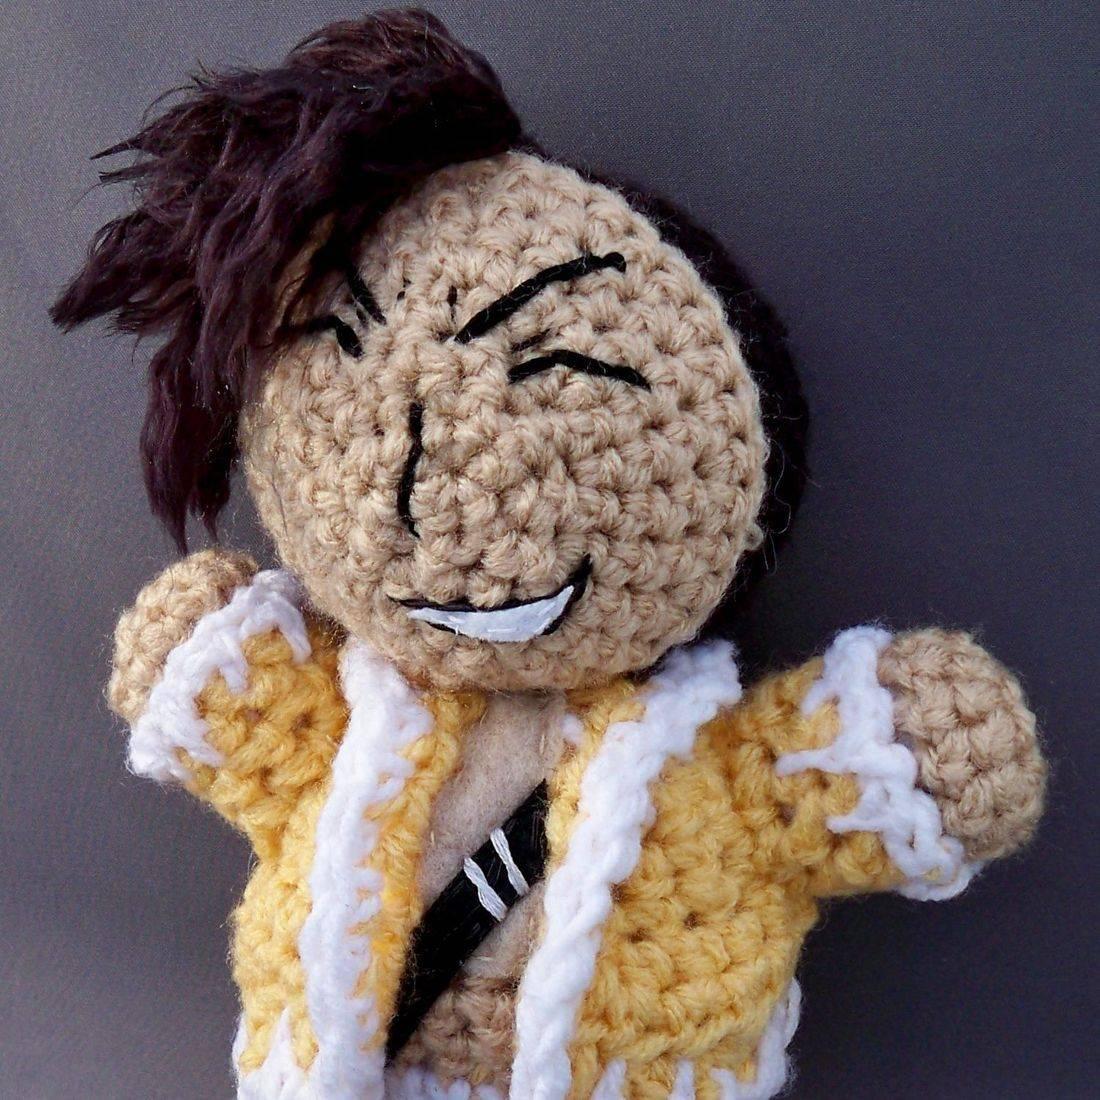 Ling Yao, Fullmetal Alchemist: Brotherhood, anime, otaku, geek, nerd, amigurumi, plush, doll, handmade, crochet